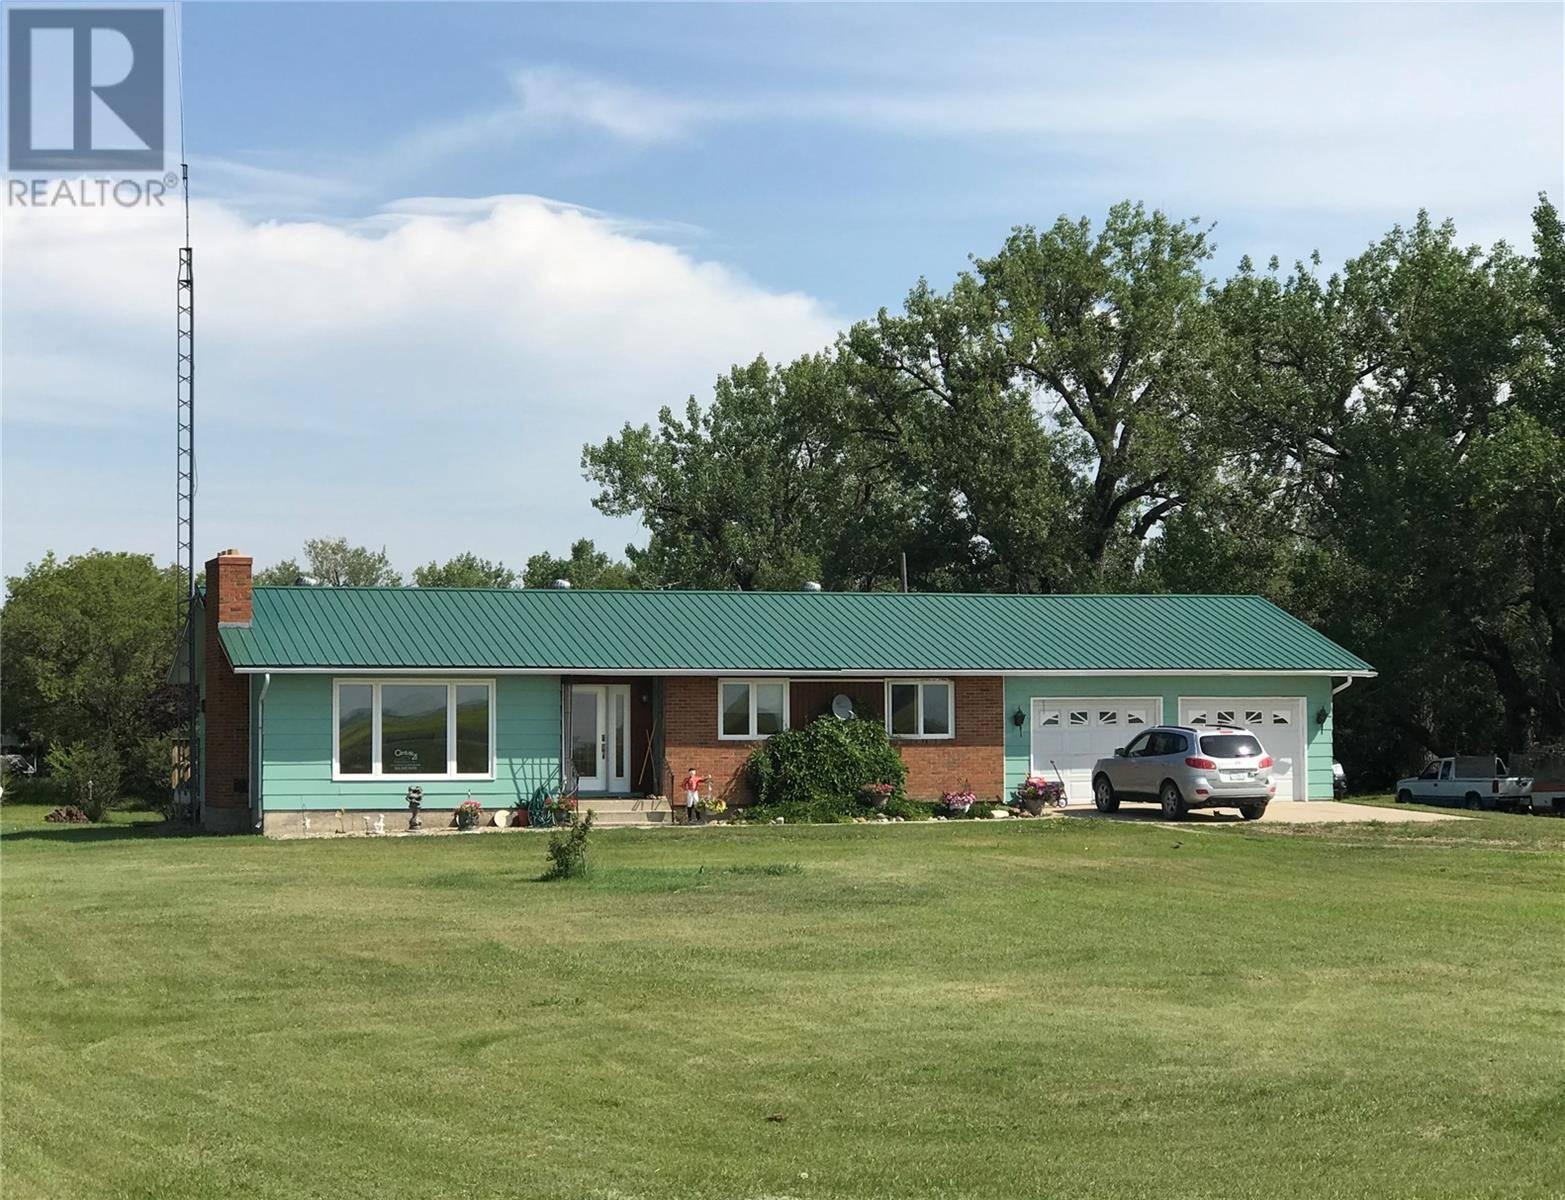 House for sale at  Rm Lumsden  Lumsden Rm No. 189 Saskatchewan - MLS: SK793834